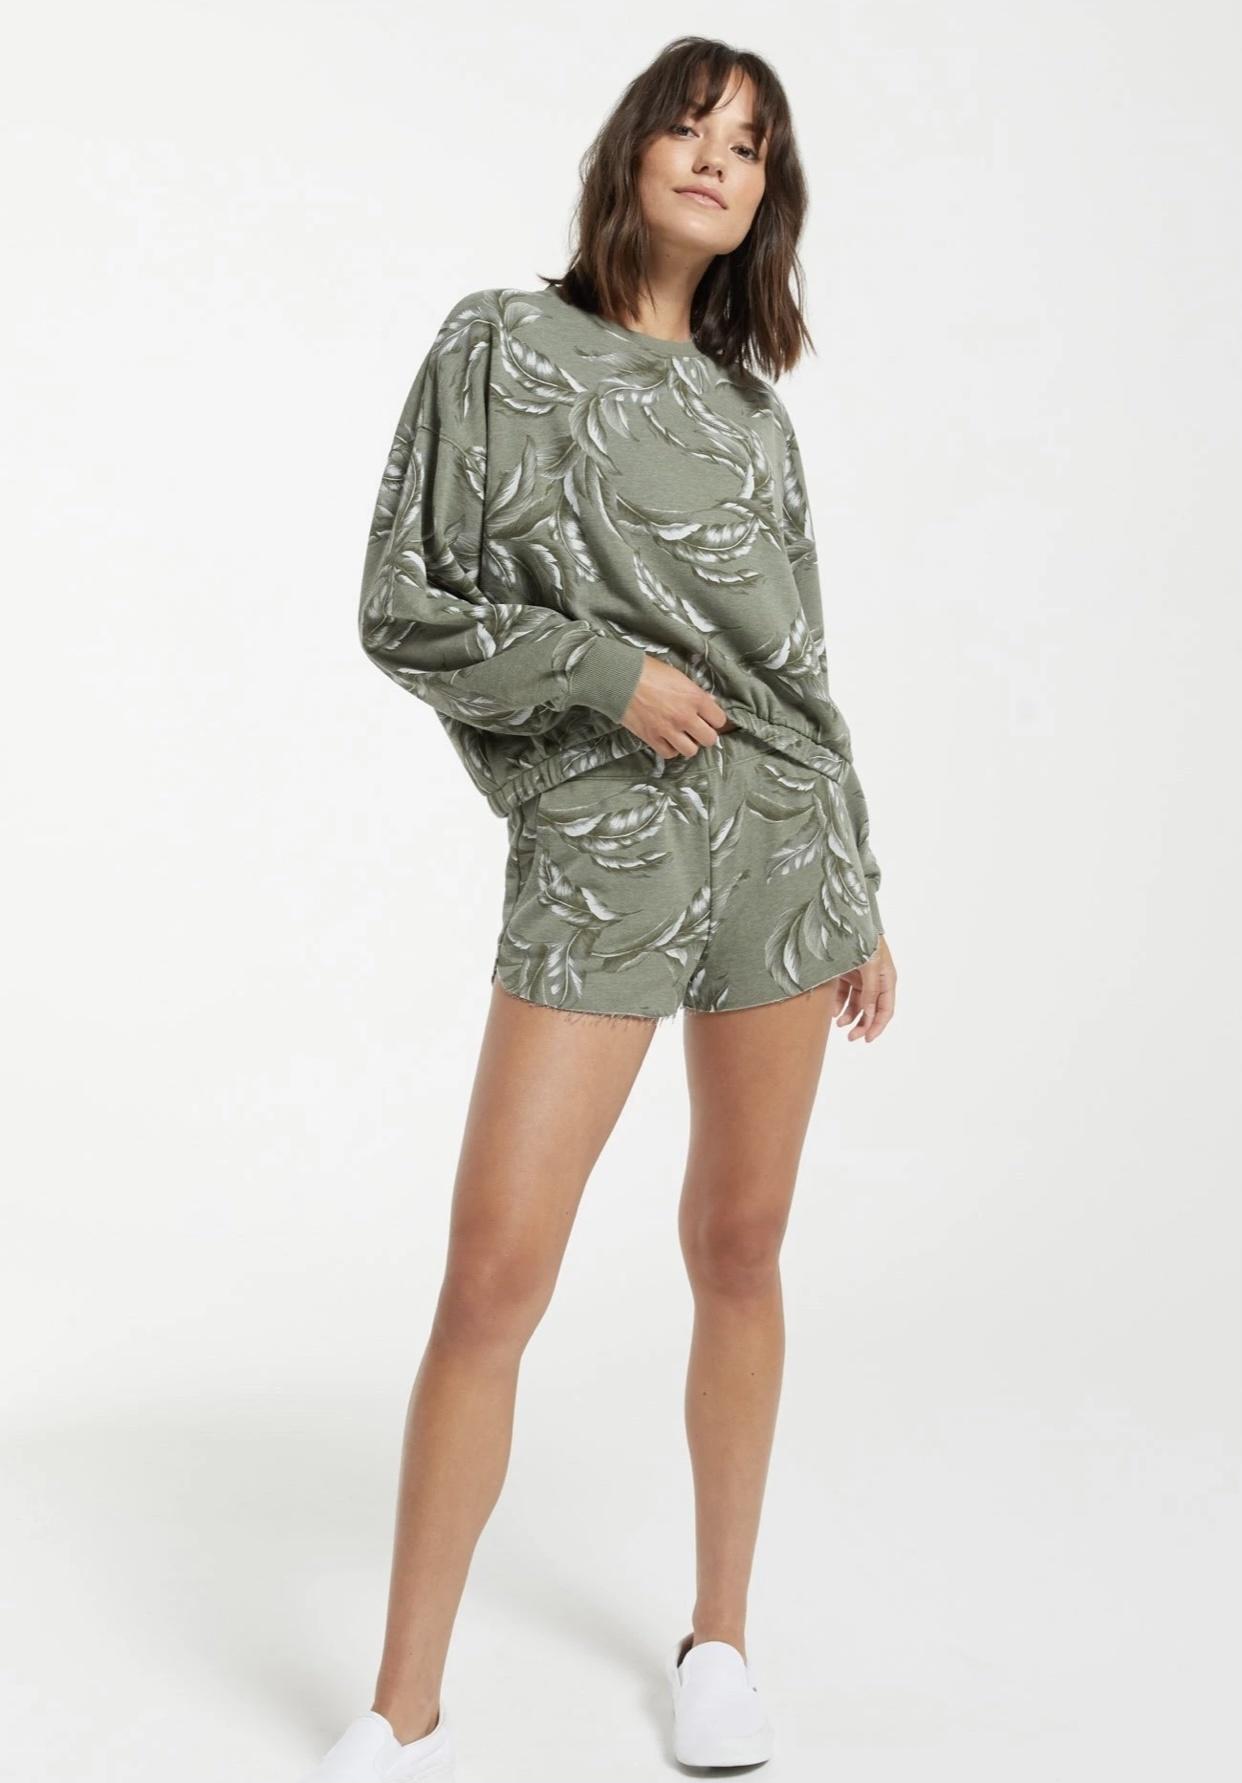 Kayla Palm Shorts